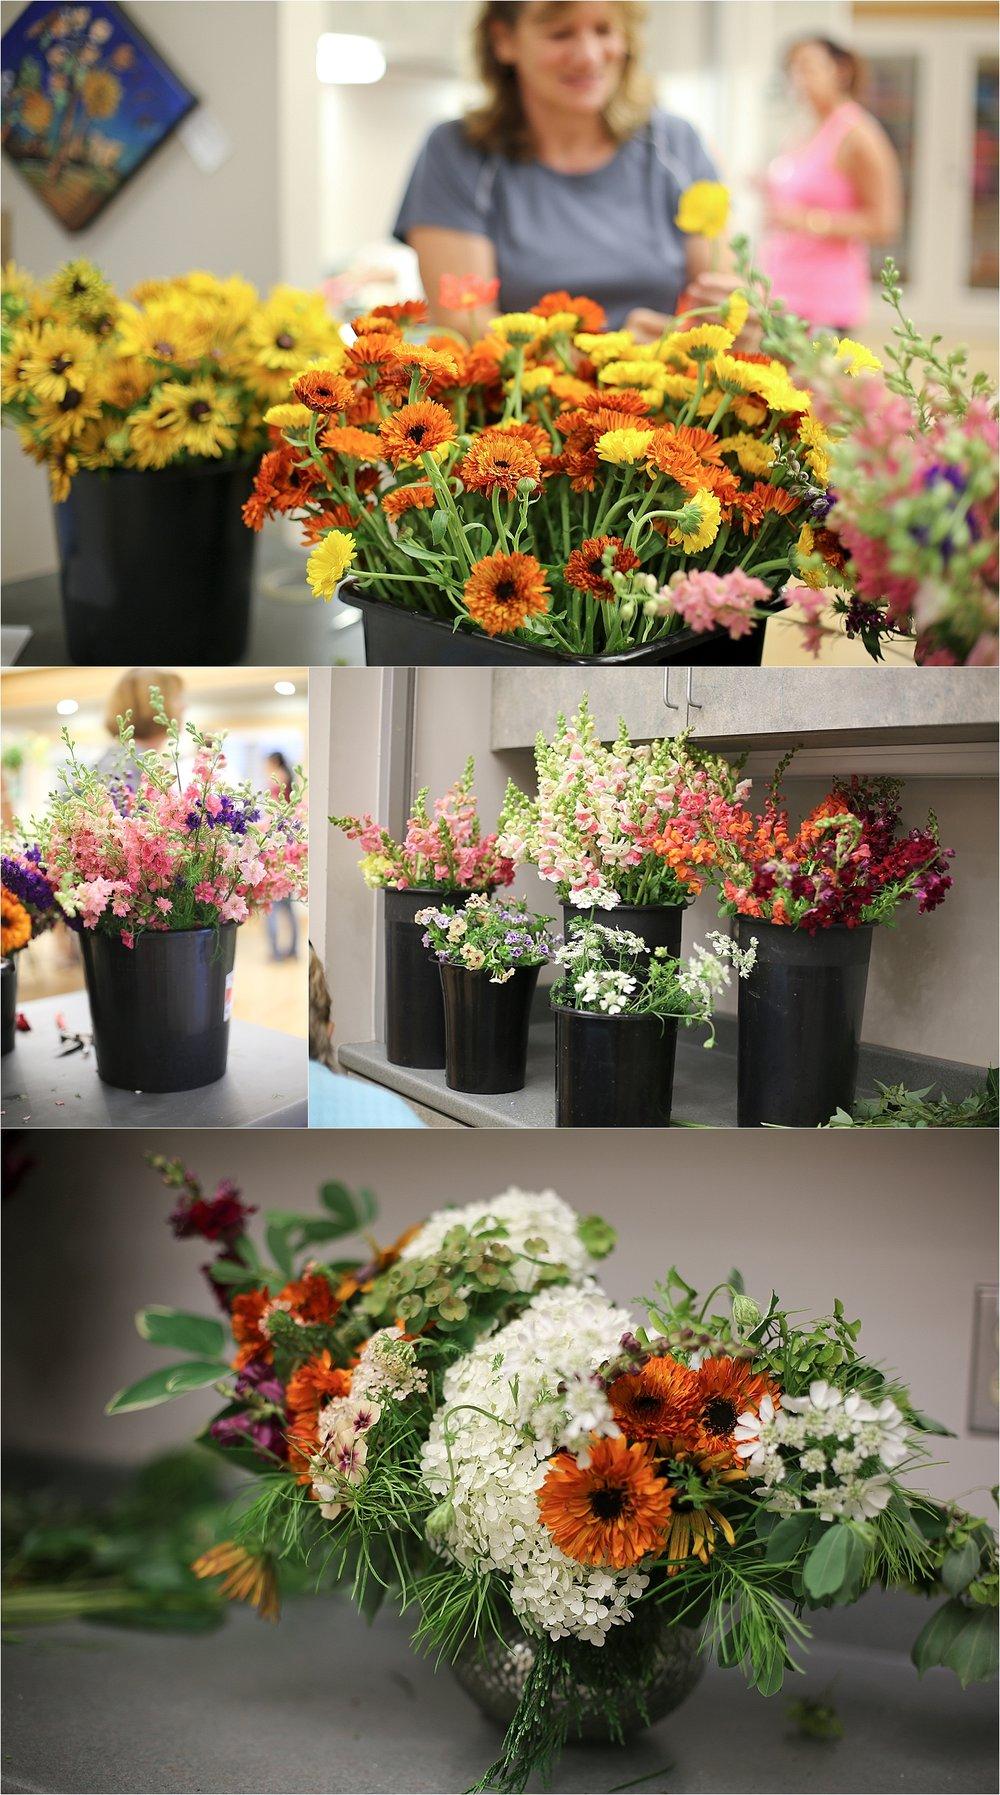 Virginia-Tech-Flower-Workshop-_0020.jpg